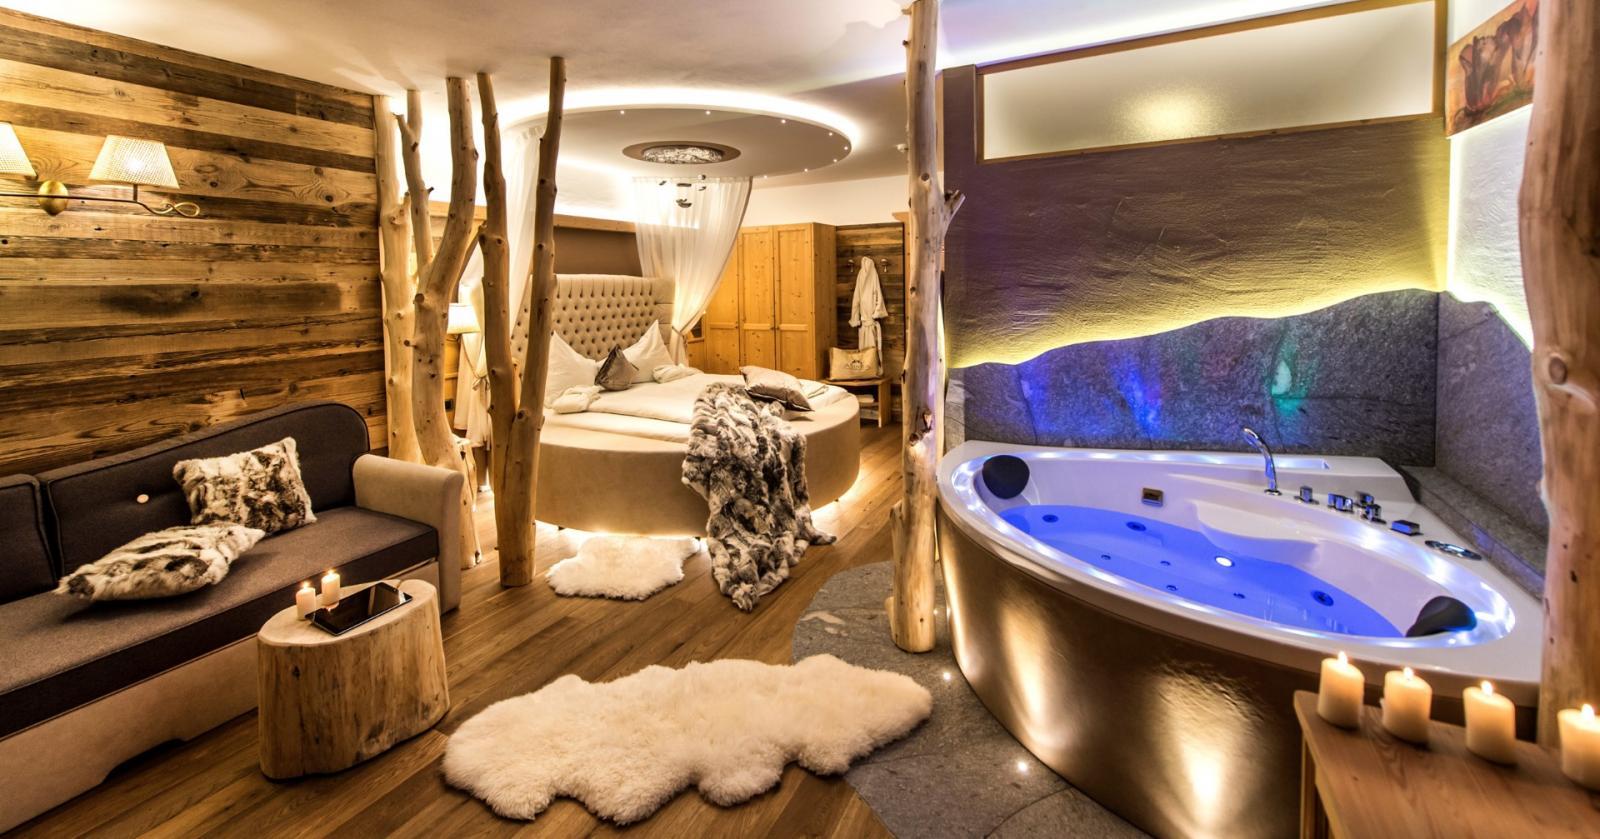 Aura-Healing: Foto vom Wellnesshotel ABINEA Dolomiti Romantic SPA Hotel | Wellness Südtirol